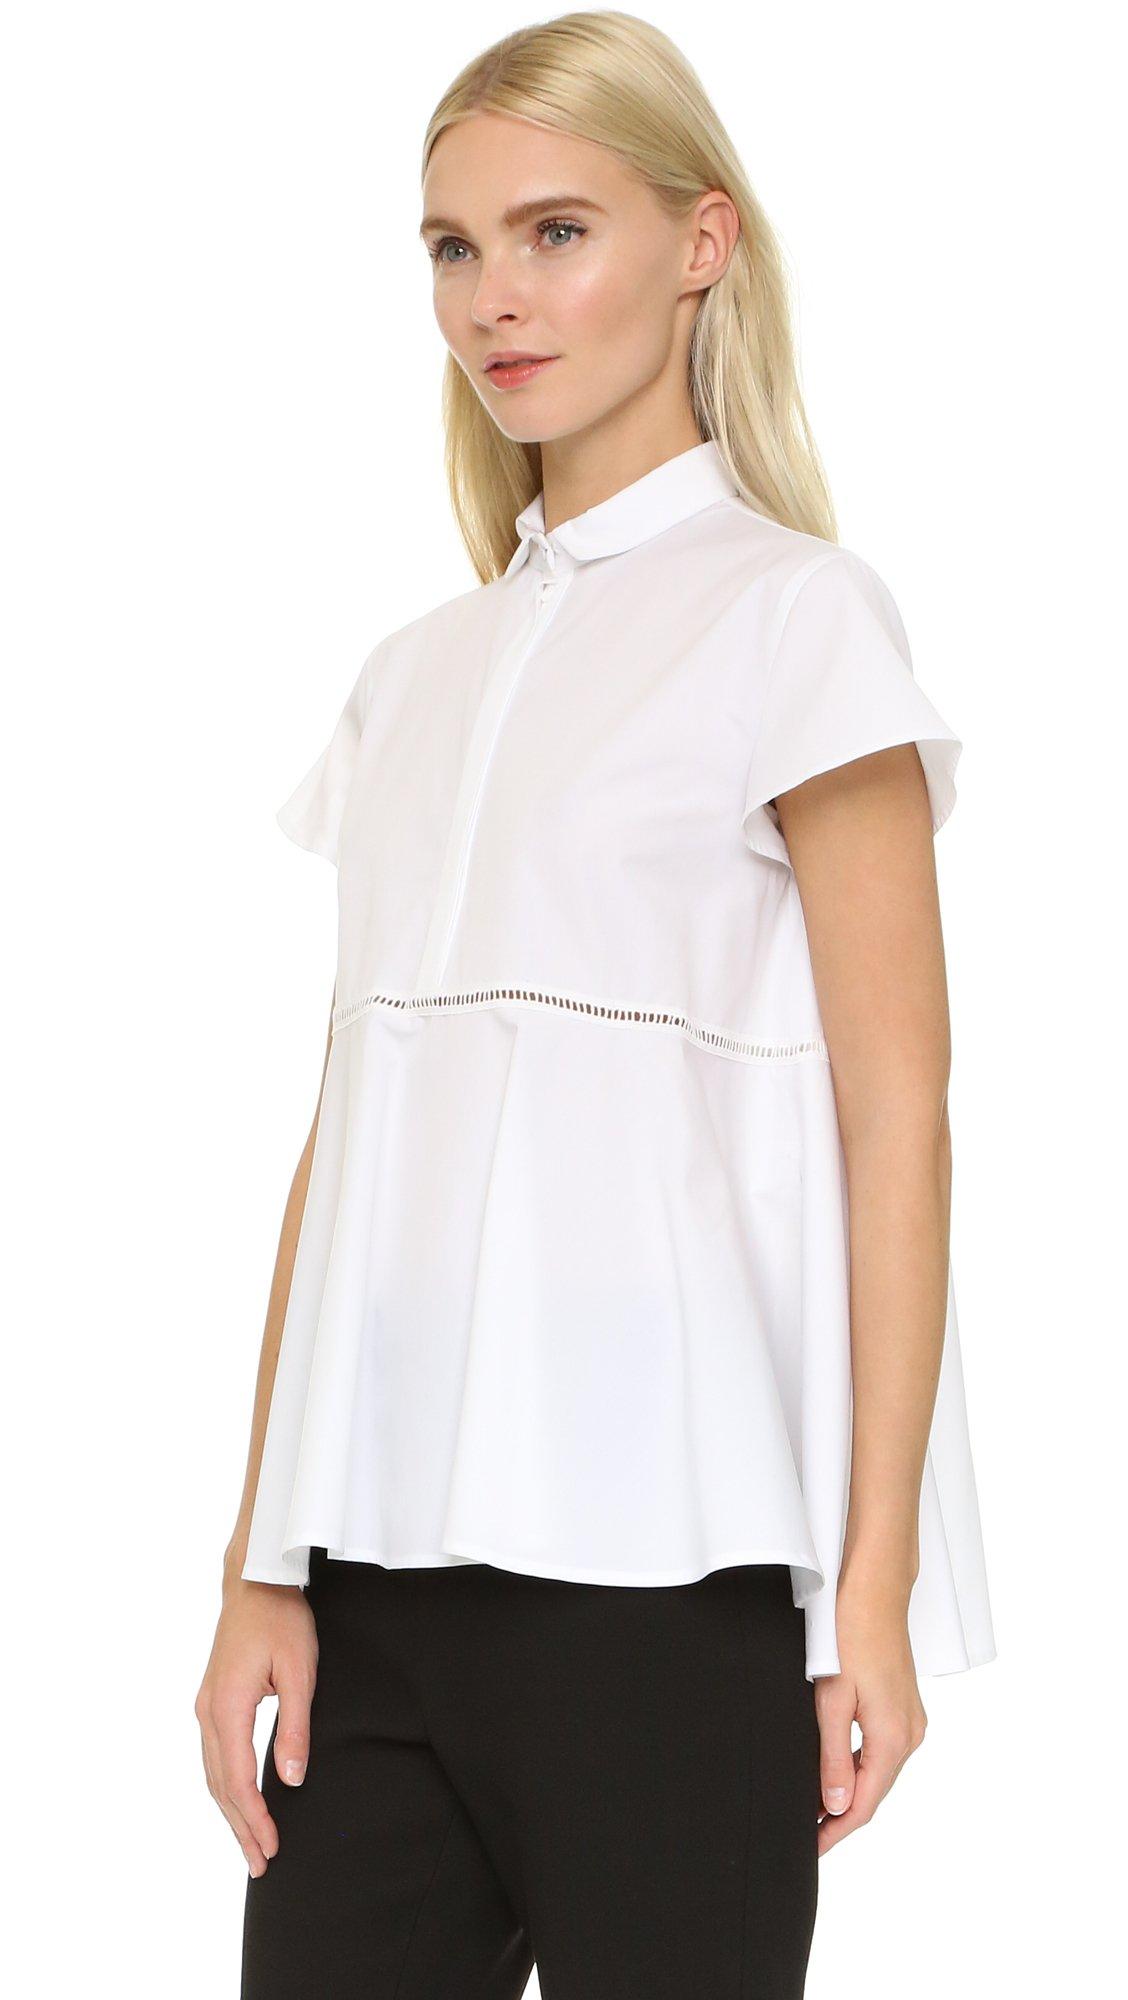 Giamba Short Sleeve Blouse in White